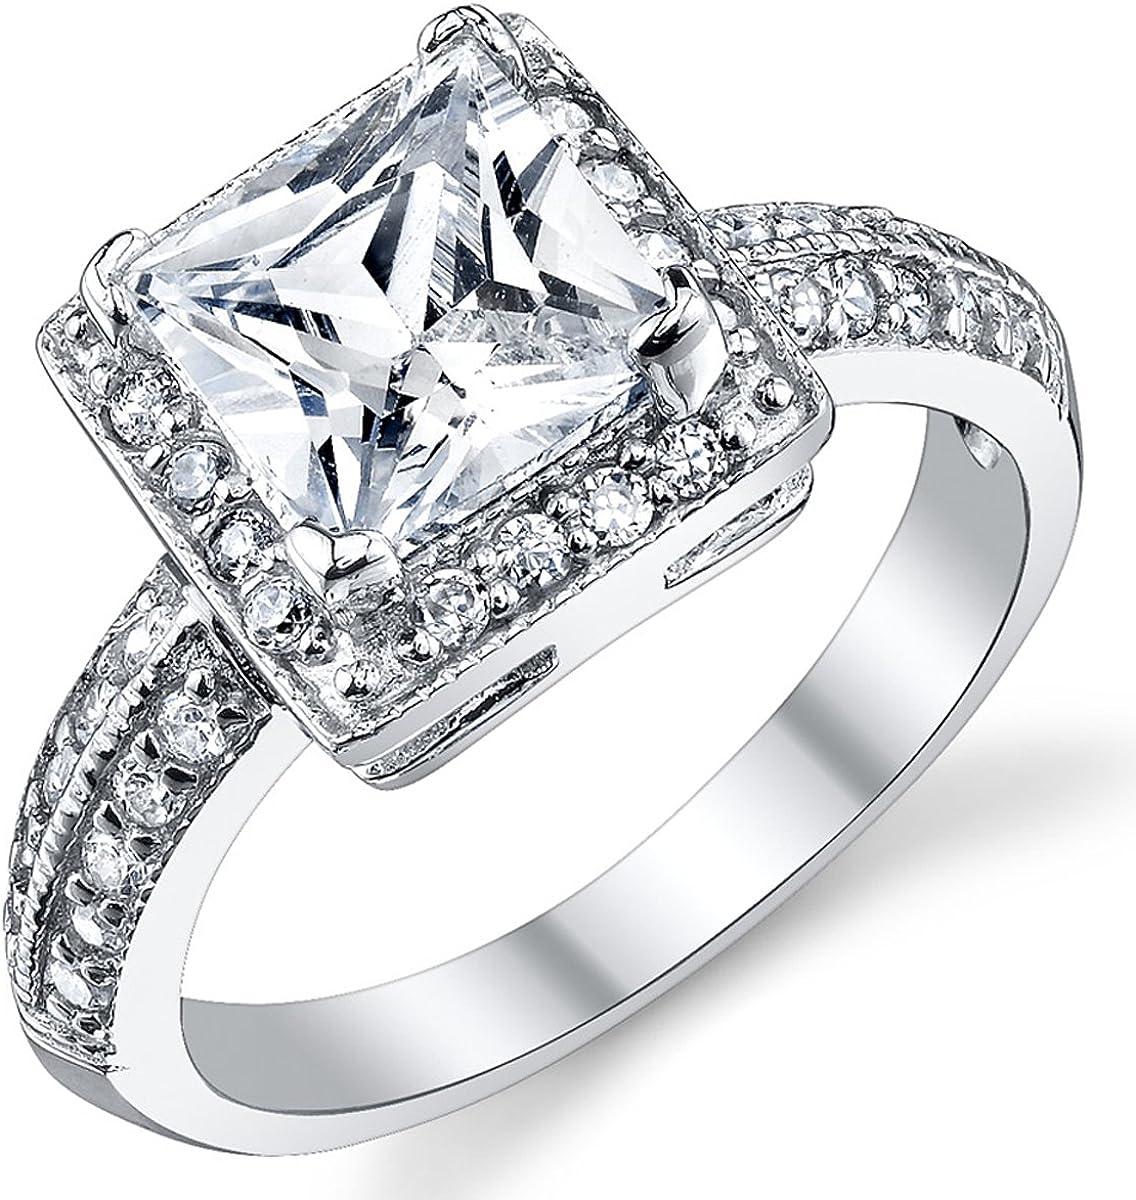 2 Carat Princess Cut Cubic Zirconia Sterling Silver 925 Wedding